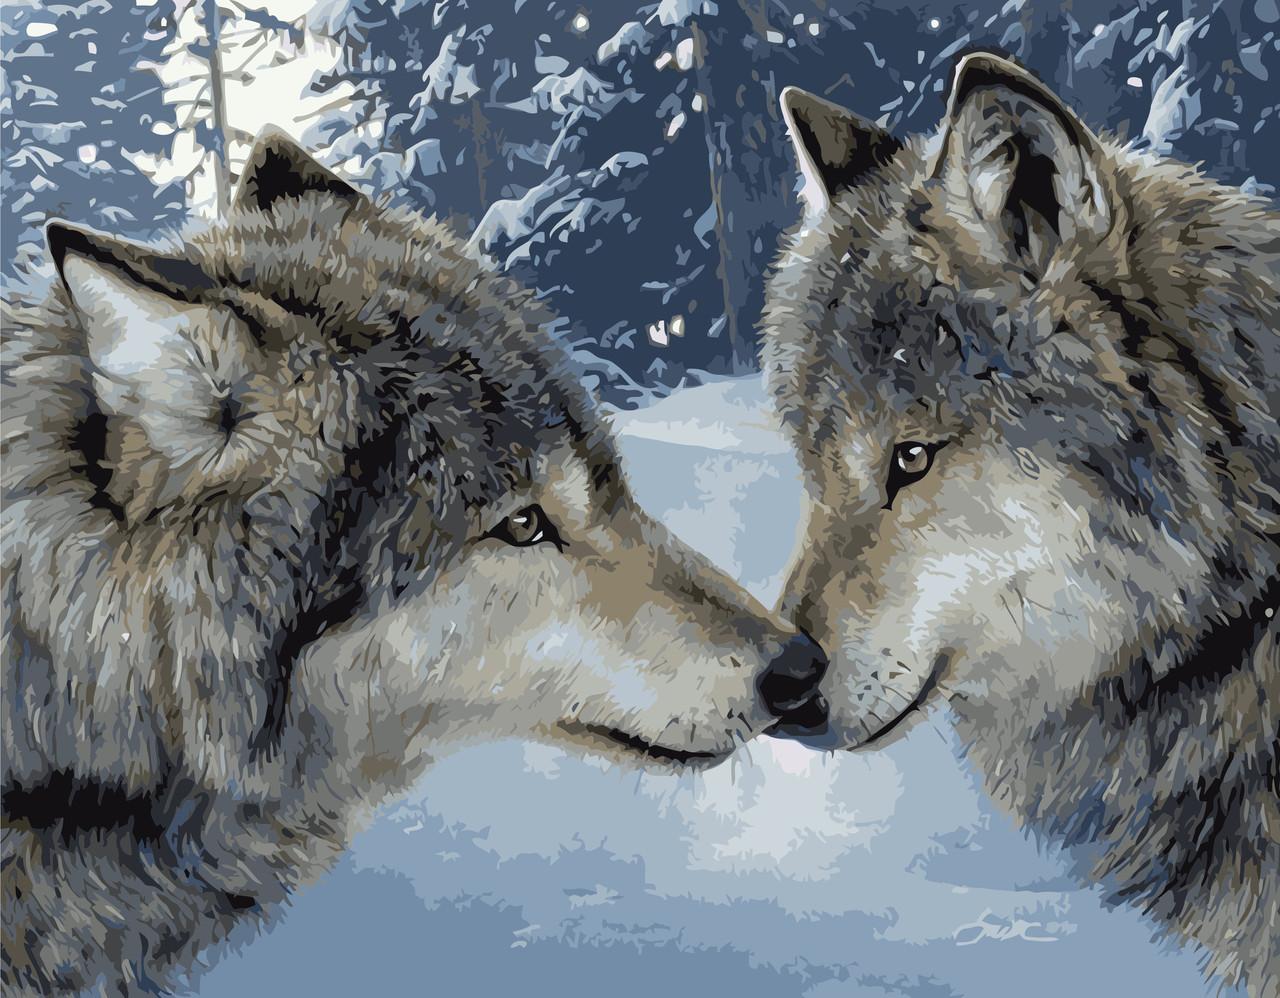 Картина по номерам VA-1651 Поцелуй волков 40х50см. Strateg